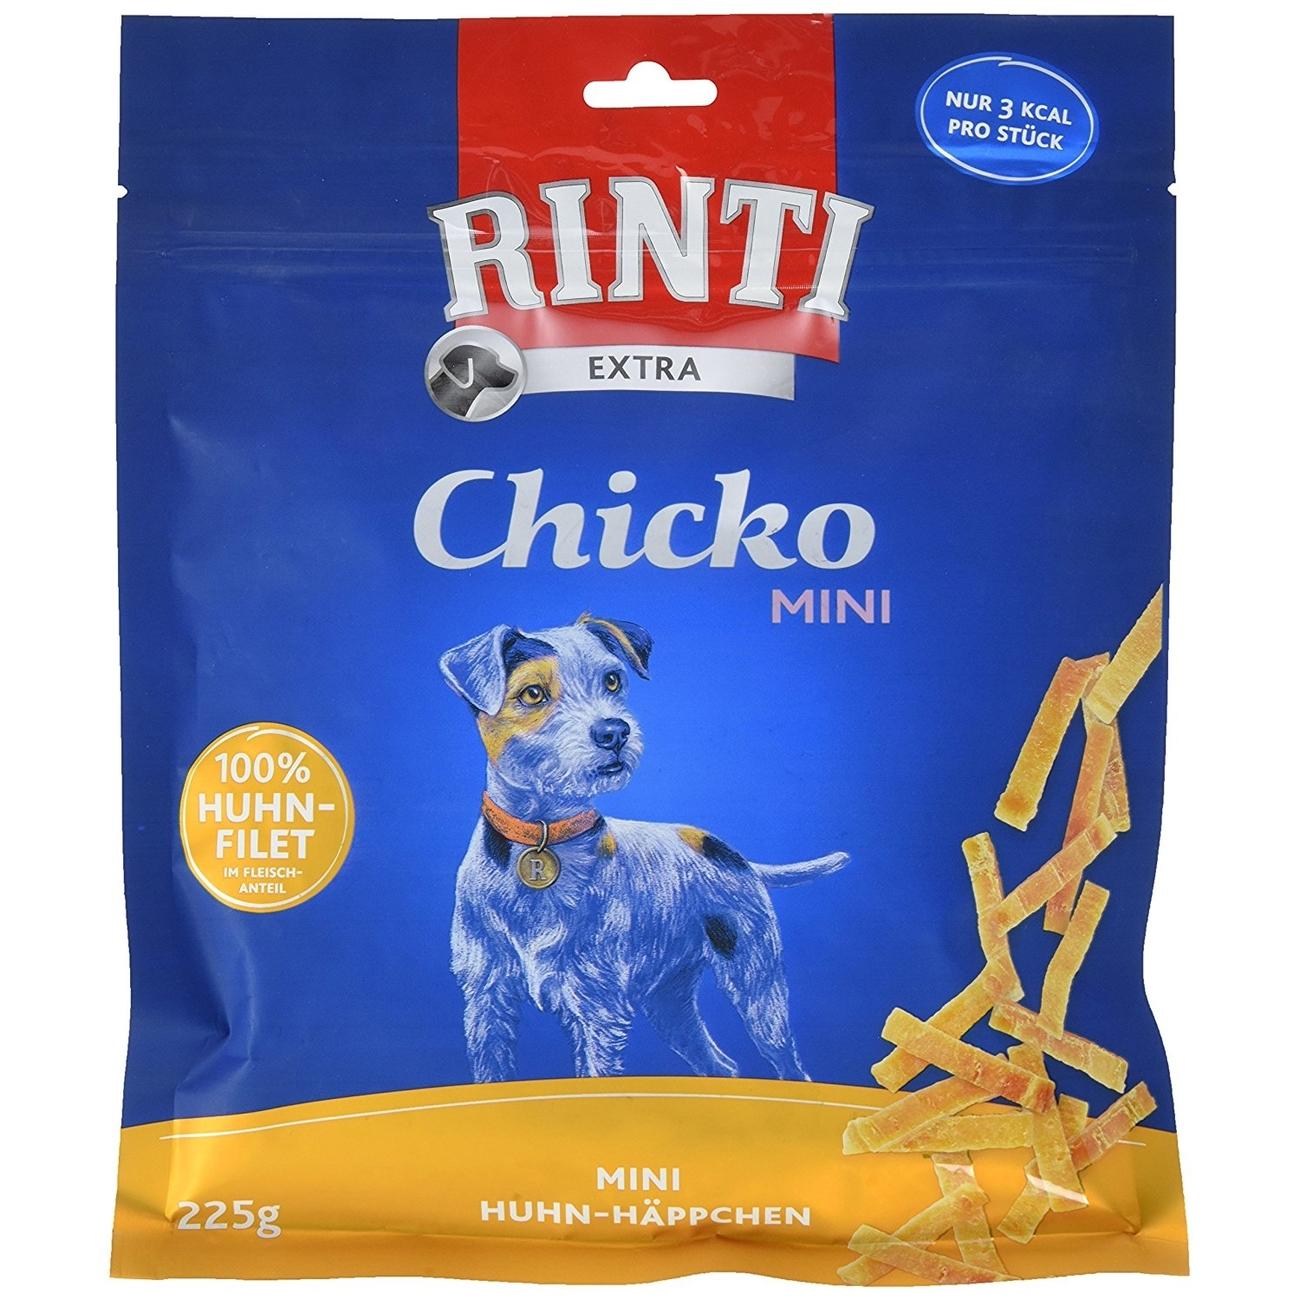 Rinti Chicko Mini Hundesnacks für kleine Hunde, Bild 5